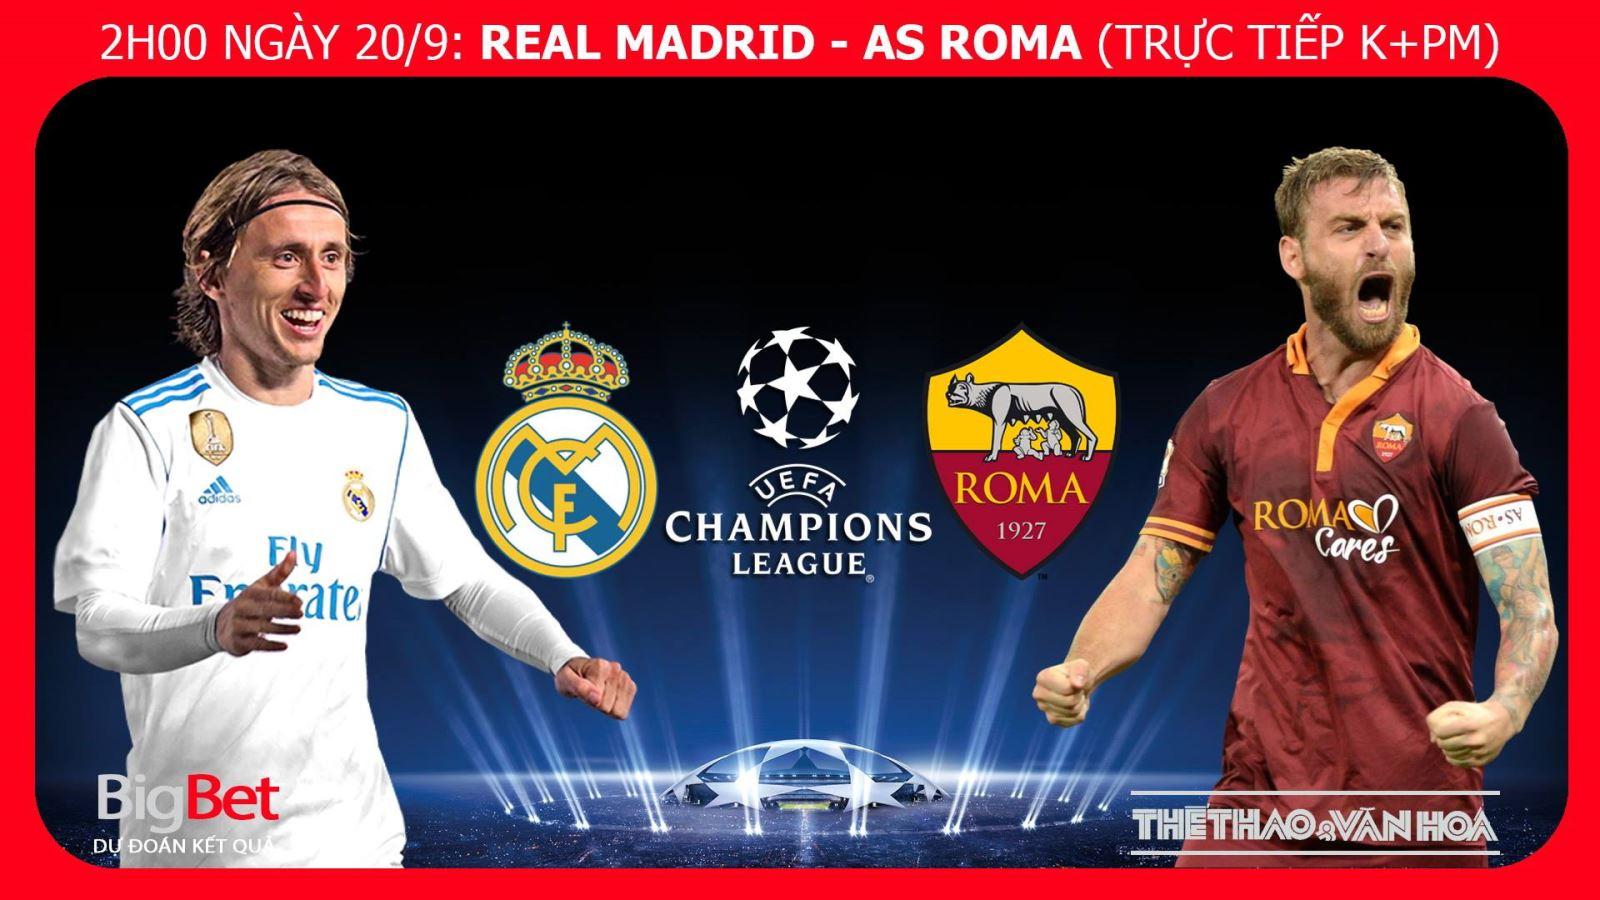 Soi kèo Real Madrid vs AS Roma. Nhận định Real Madrid vs AS Roma